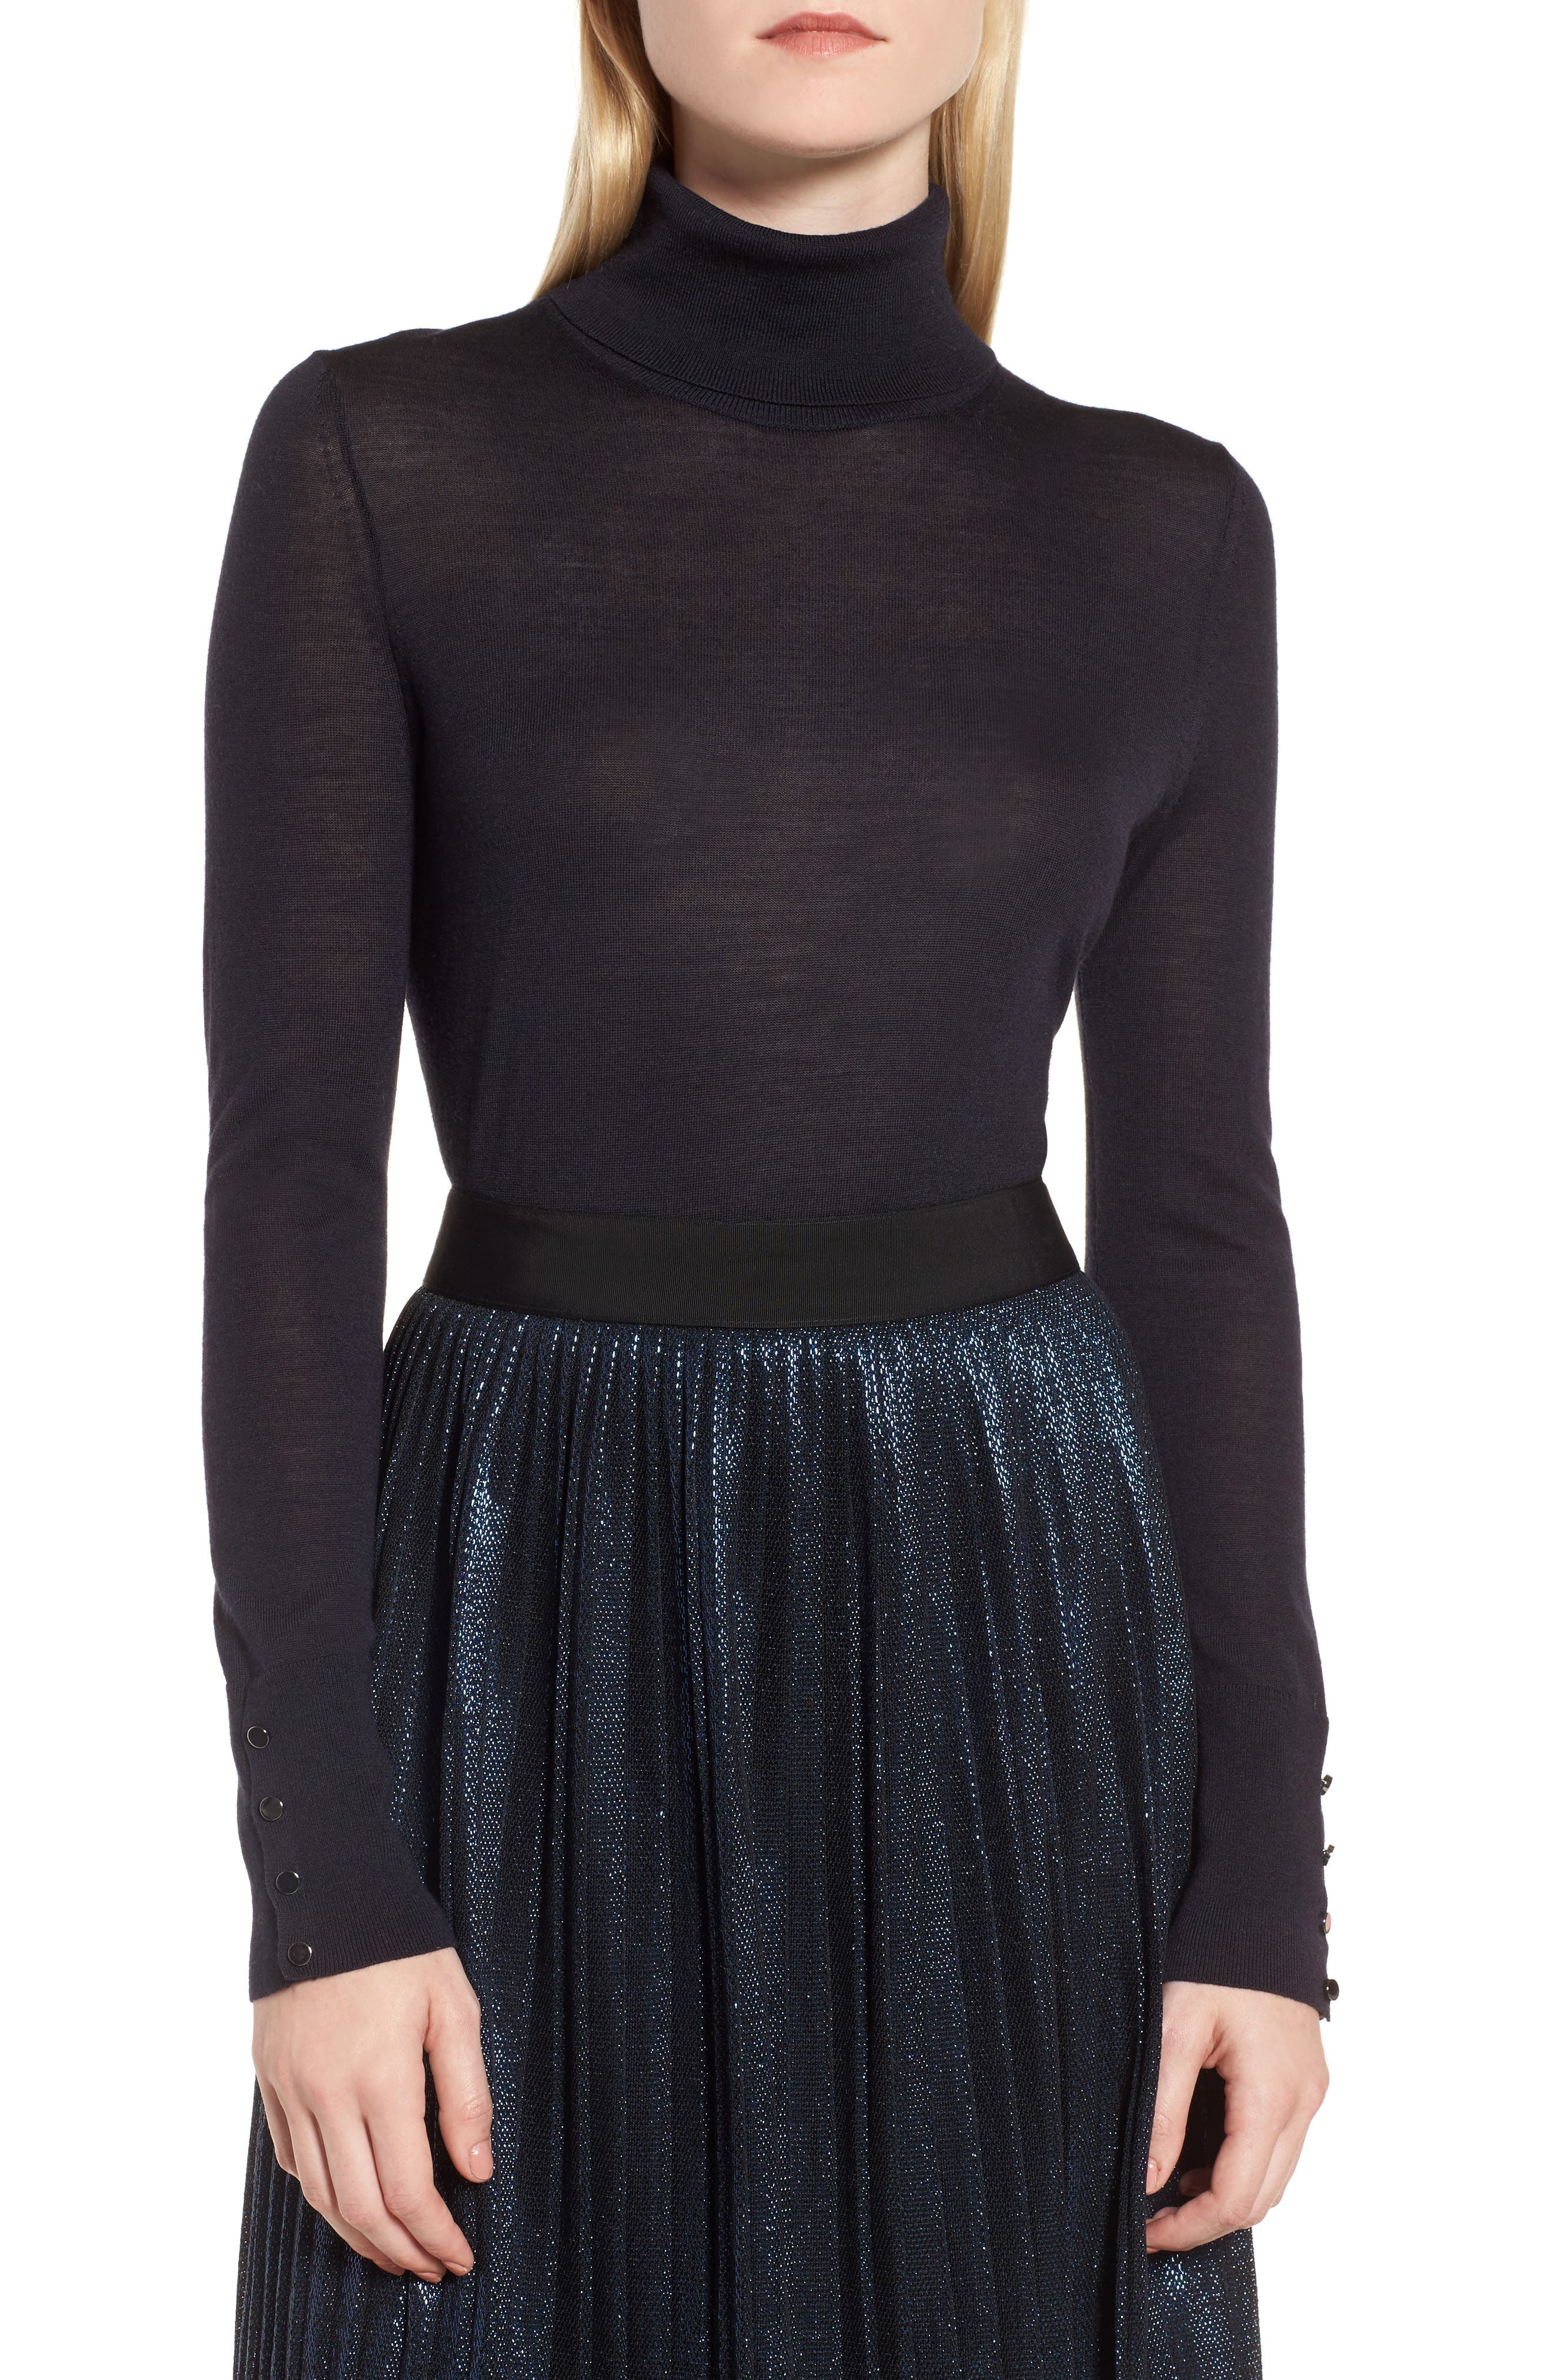 Farrella Wool Turtleneck Sweater,                         Main,                         color, 480